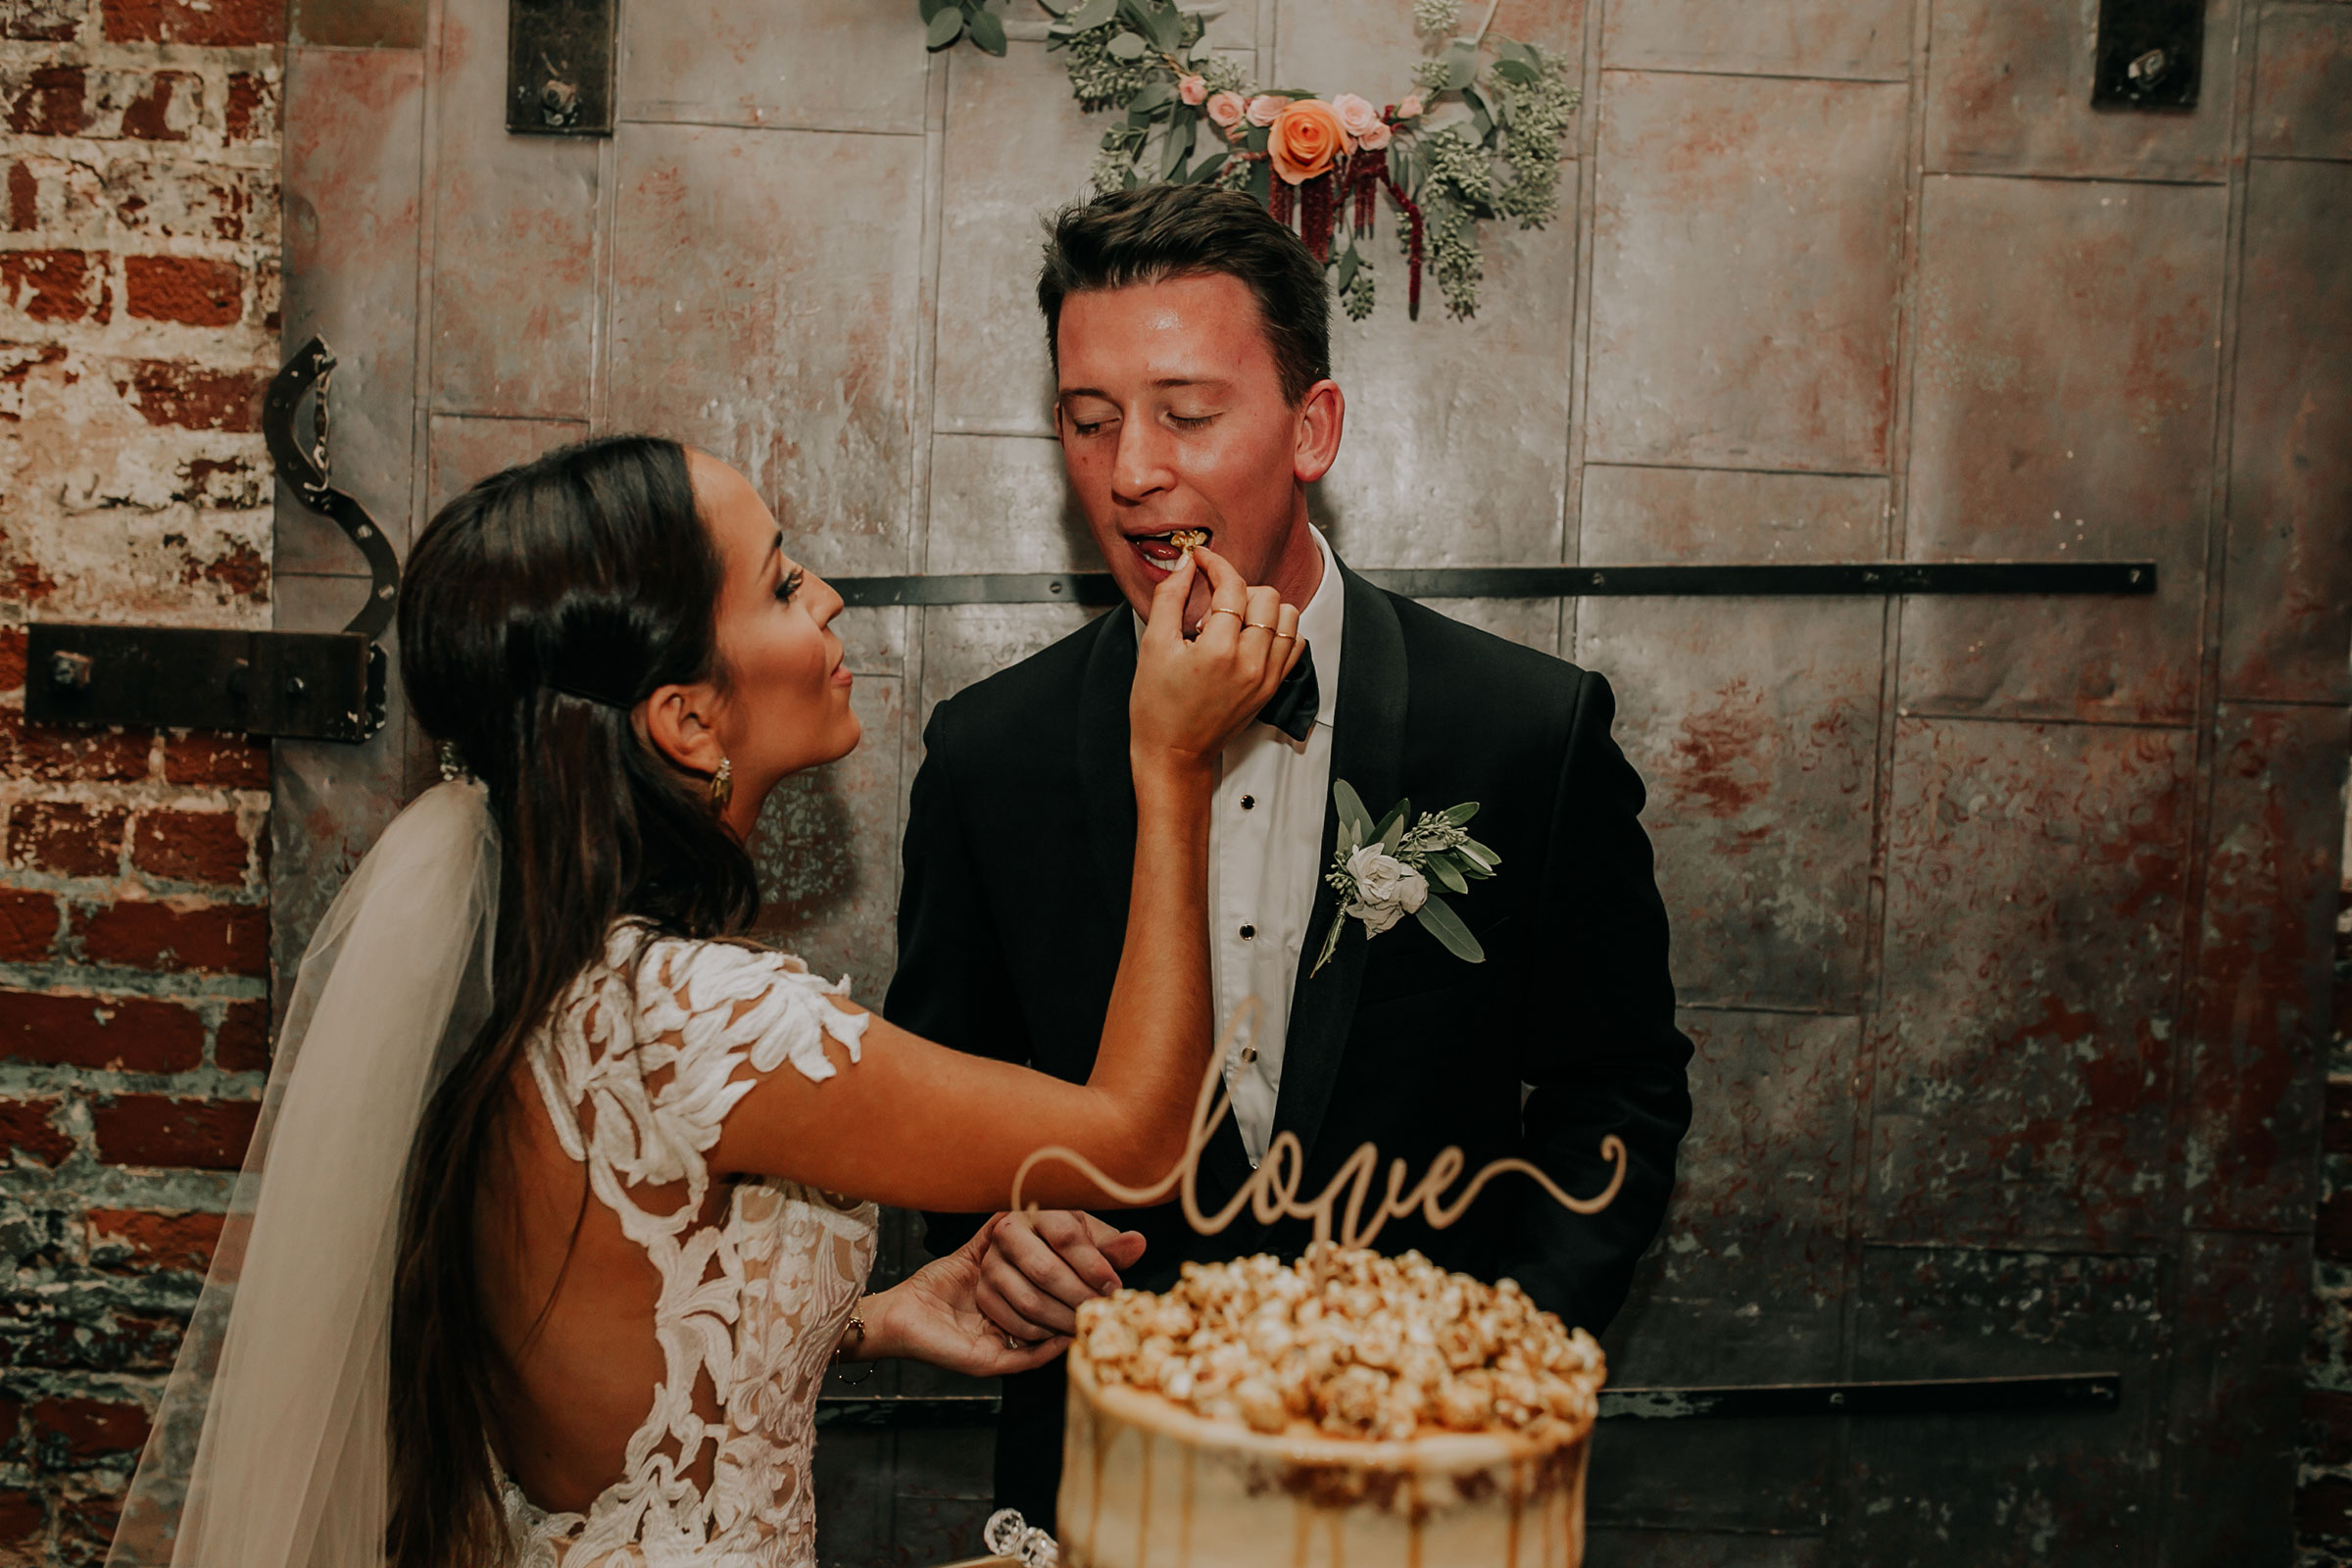 wedding-couple-eating-popcorn-cake-founders-one-nine-omaha-nebraska-raelyn-ramey-photography.jpg